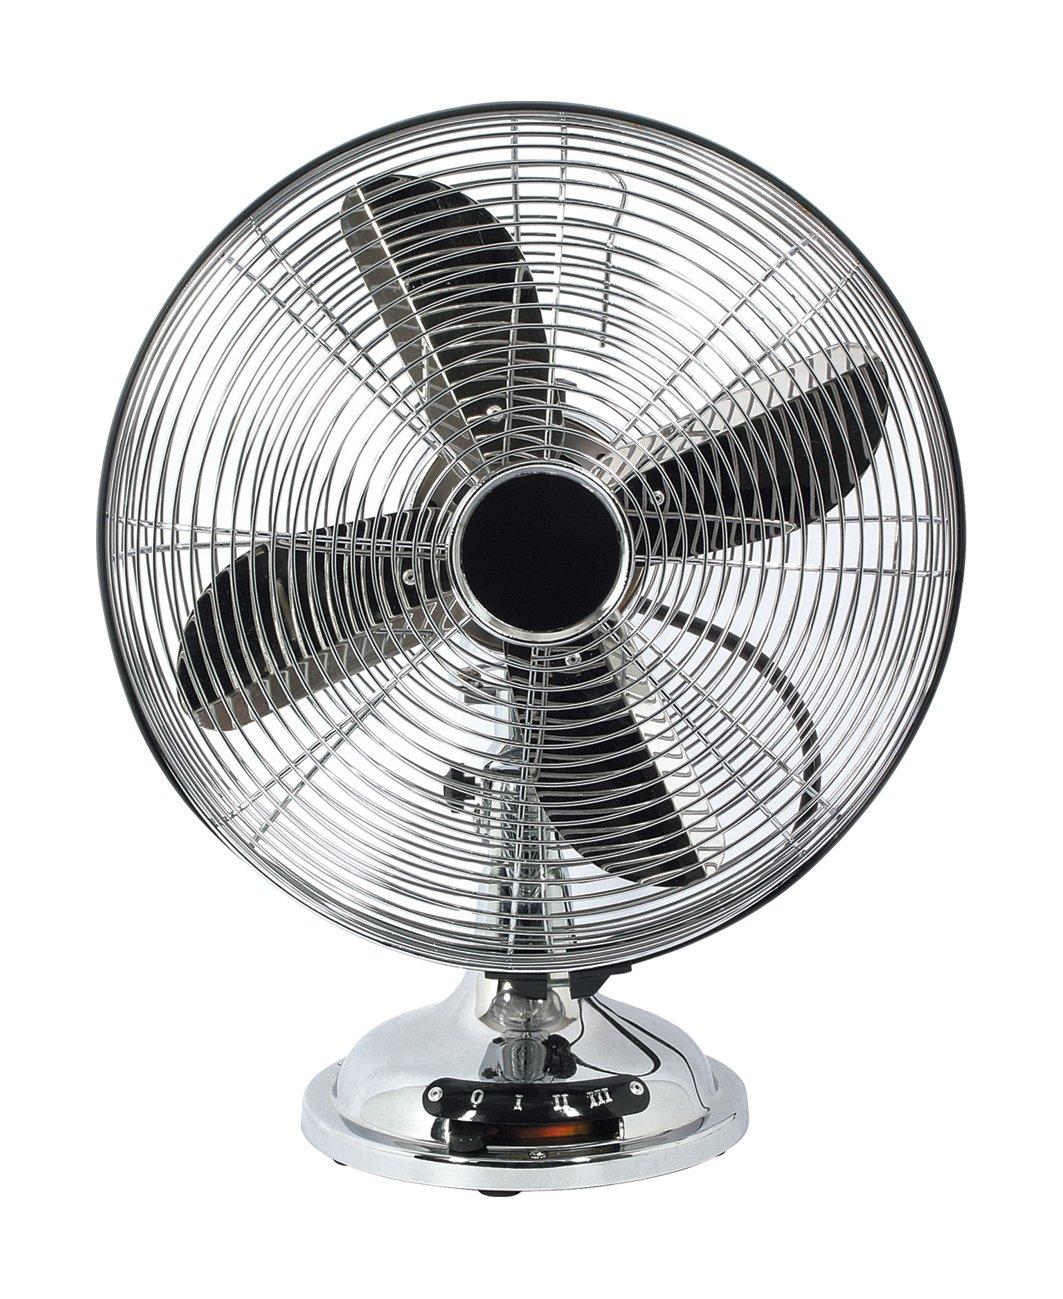 Ventilatori l 39 aria fresca del design cose di casa - Griglie di aerazione design ...